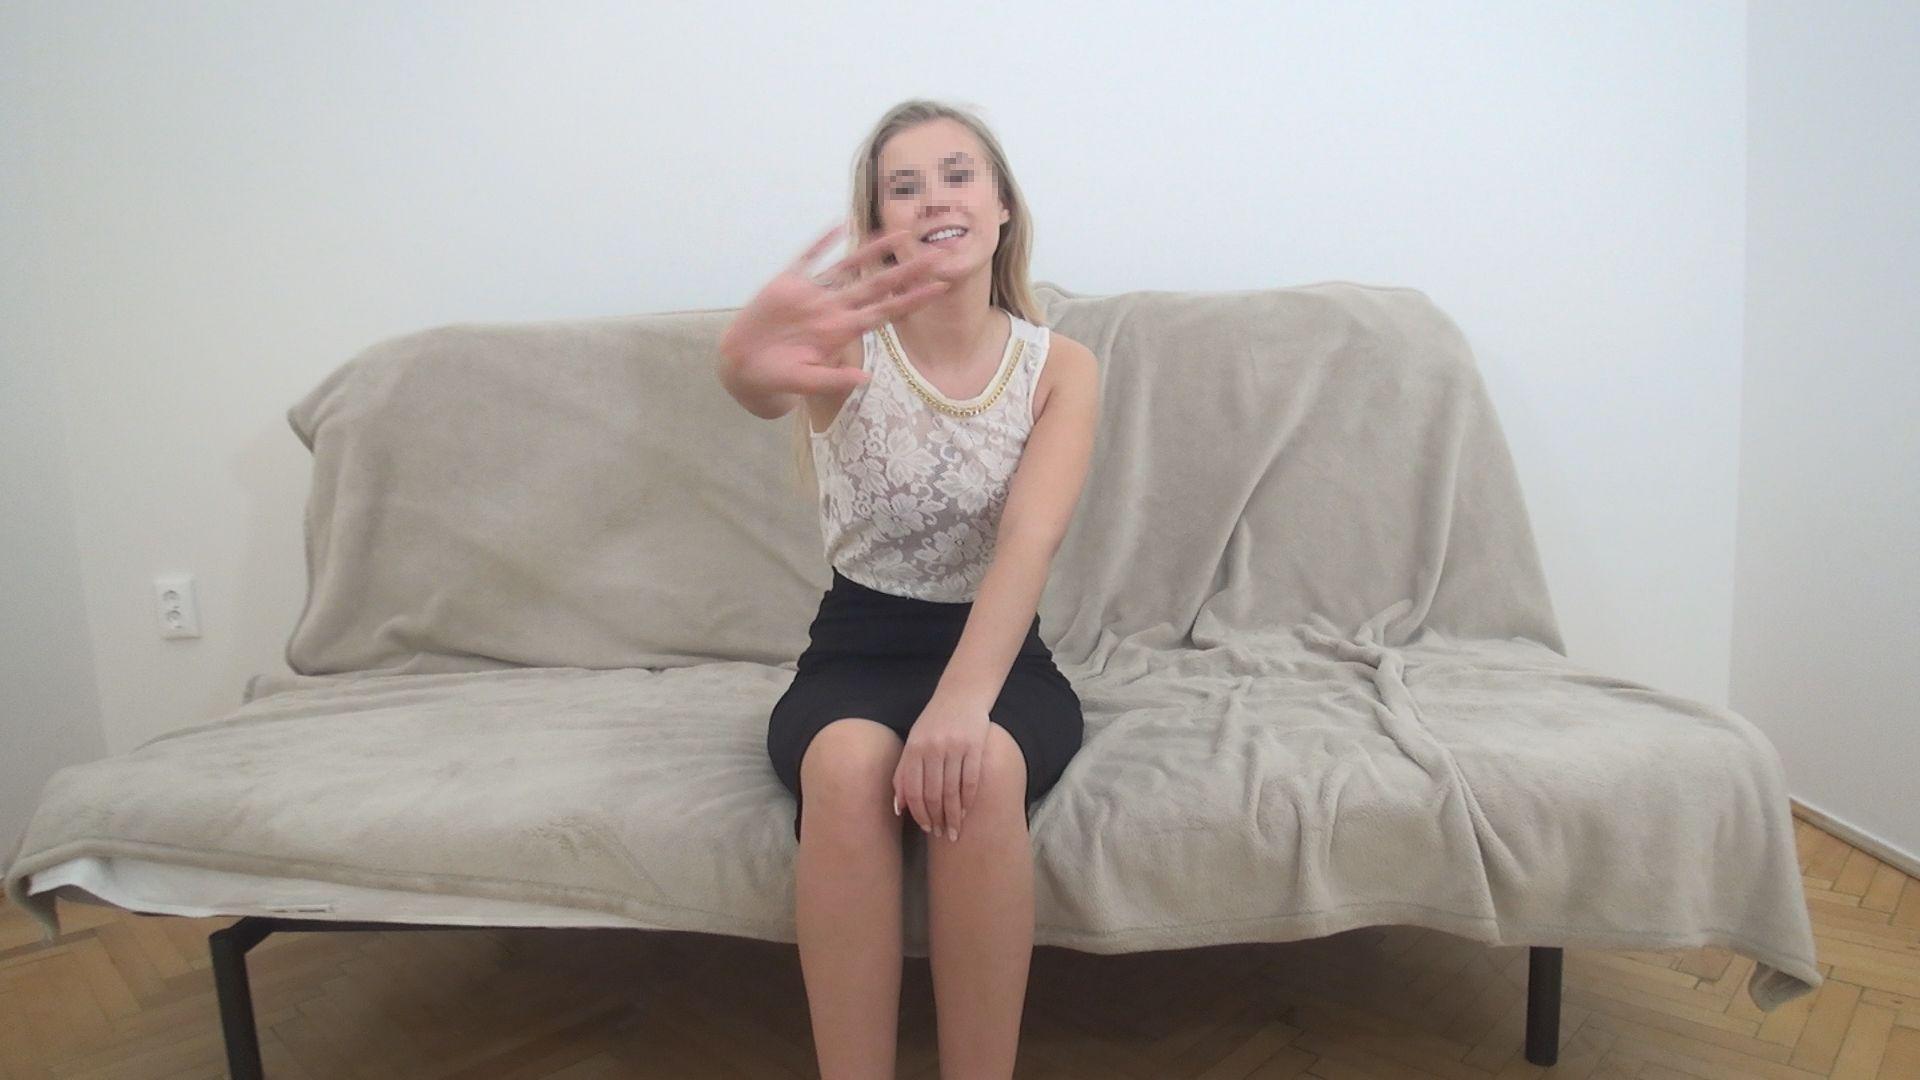 FC2 PPV 1176735 不倫主婦の性告白ドキュメンタリー【ヨーロッパ特別編】20歳のブロンド美女人妻に生中出し 「貴方がこれを見て嫉妬することを祈ってるわ」【個人撮影】高画質ZIP付き